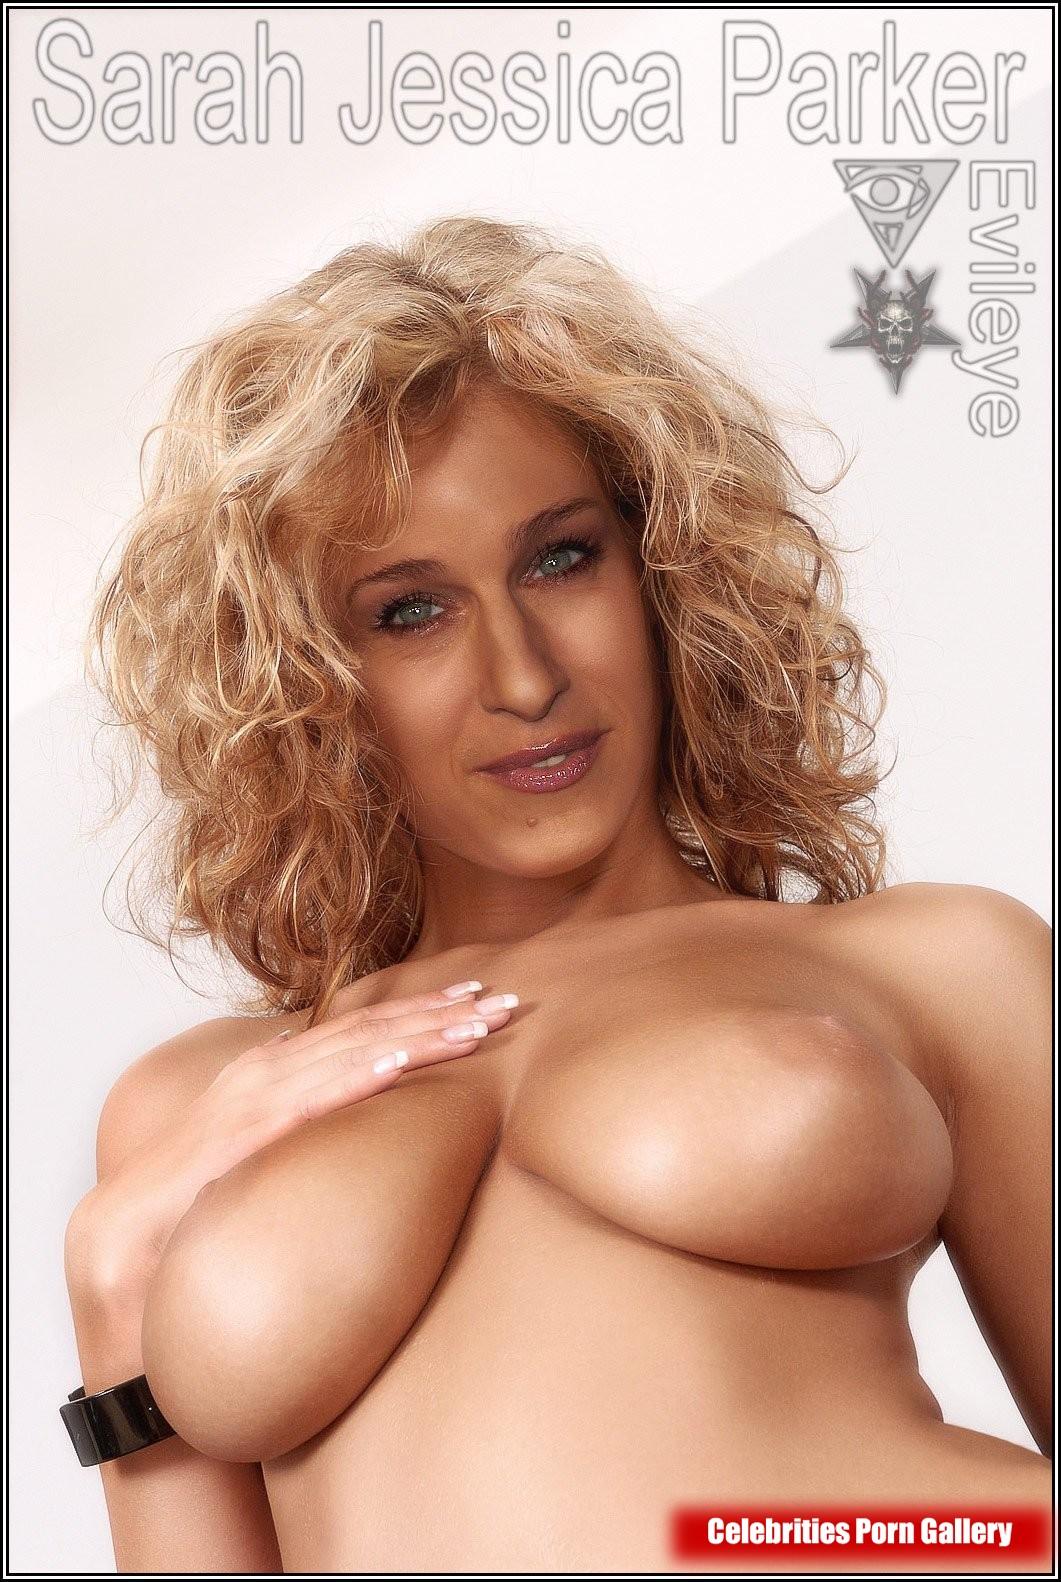 Sarah Jessica Parker Nude Photos